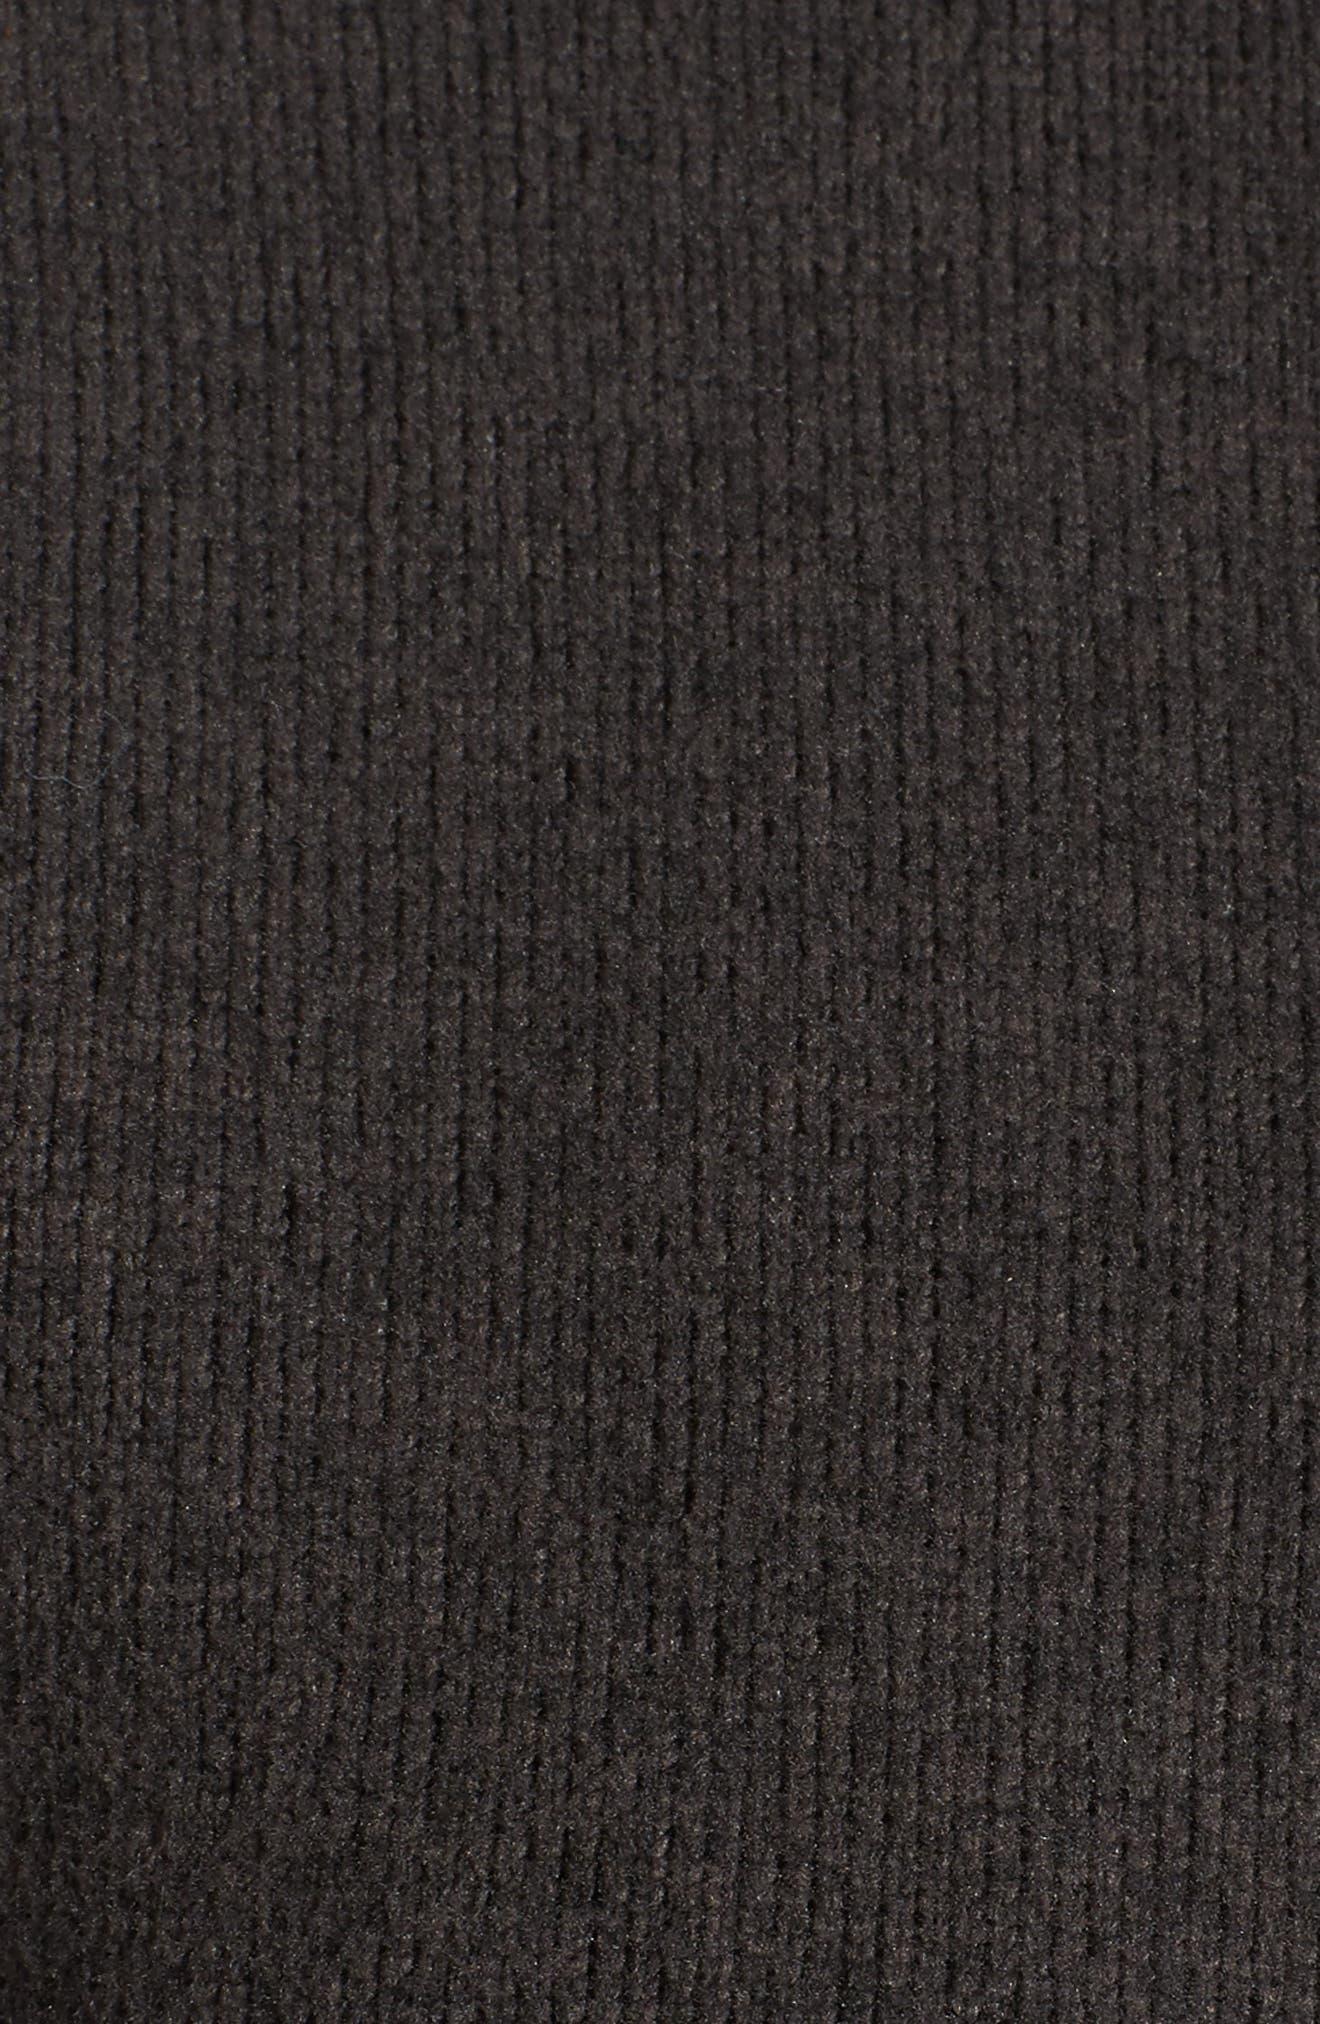 Crescent Parka Fleece,                             Alternate thumbnail 6, color,                             Tnf Black Heather